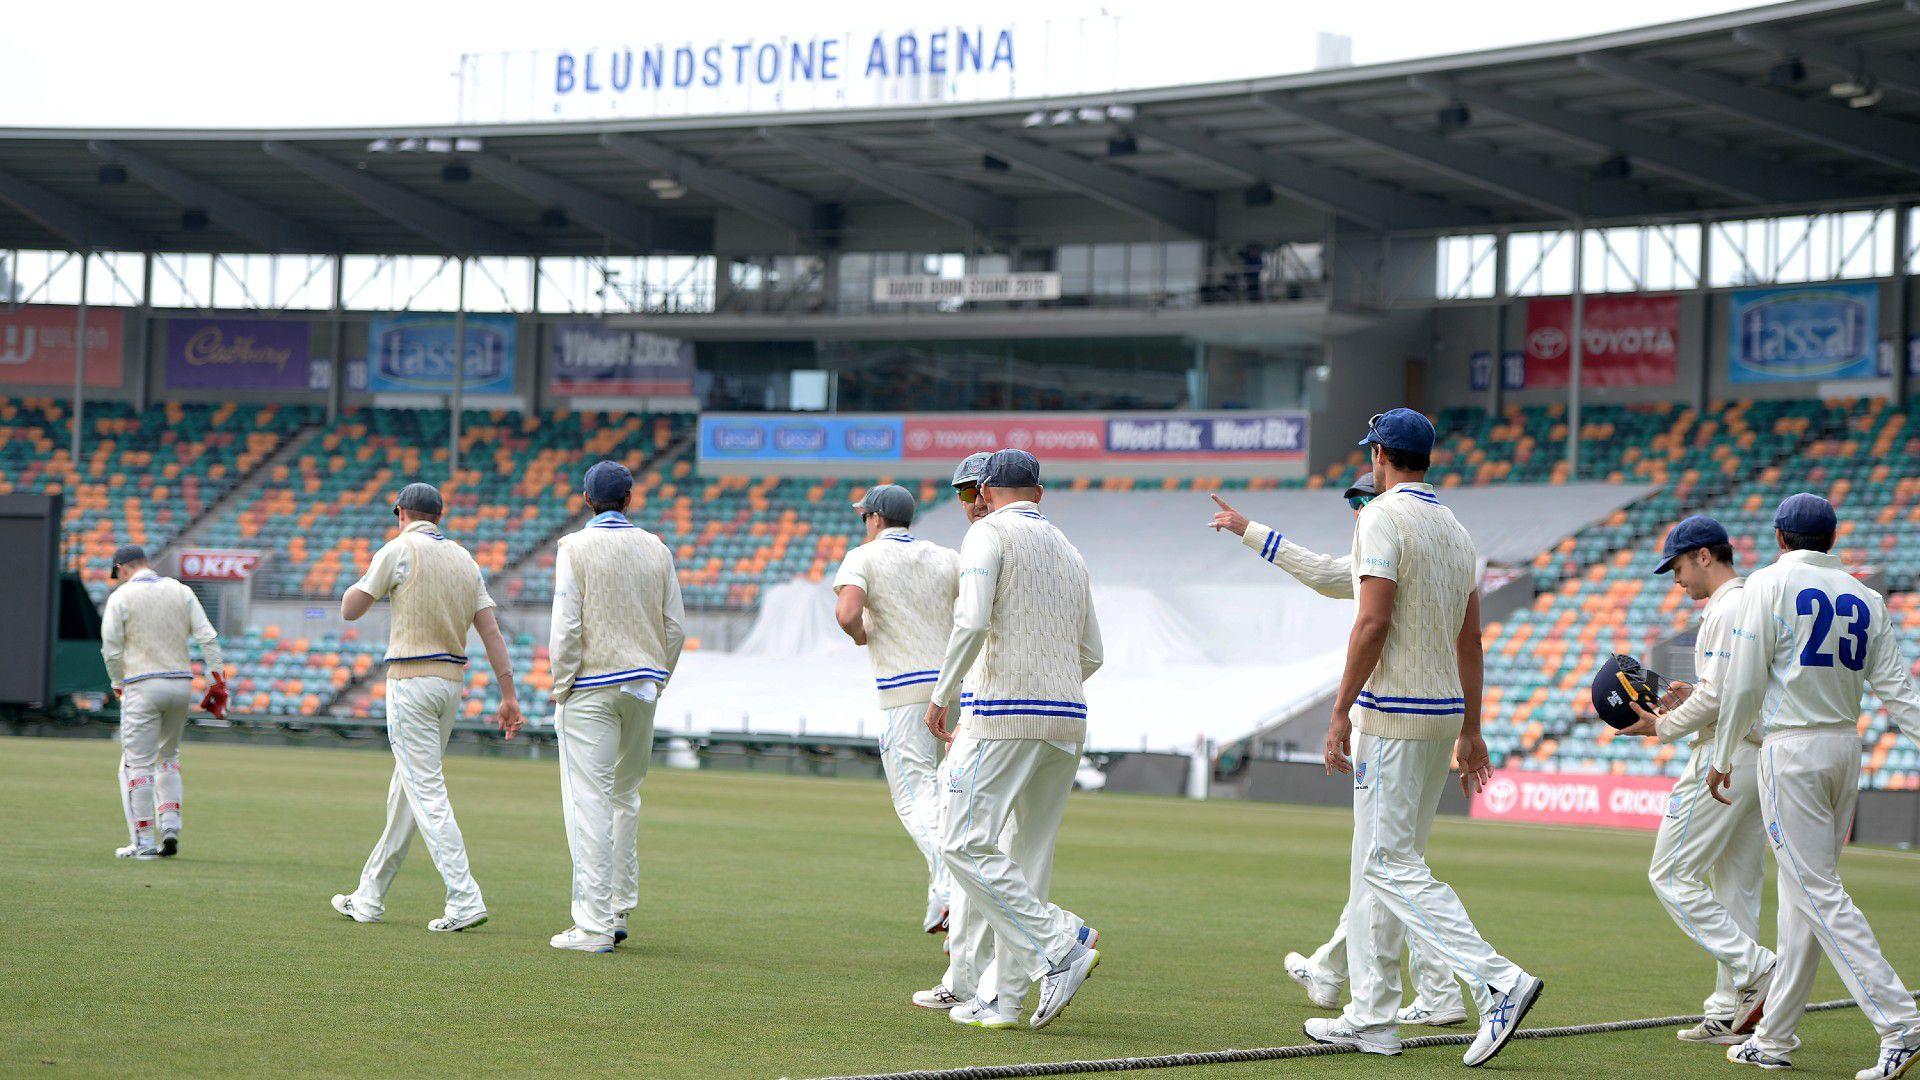 NSW Blues confirm no travel for domestic cricket in near future